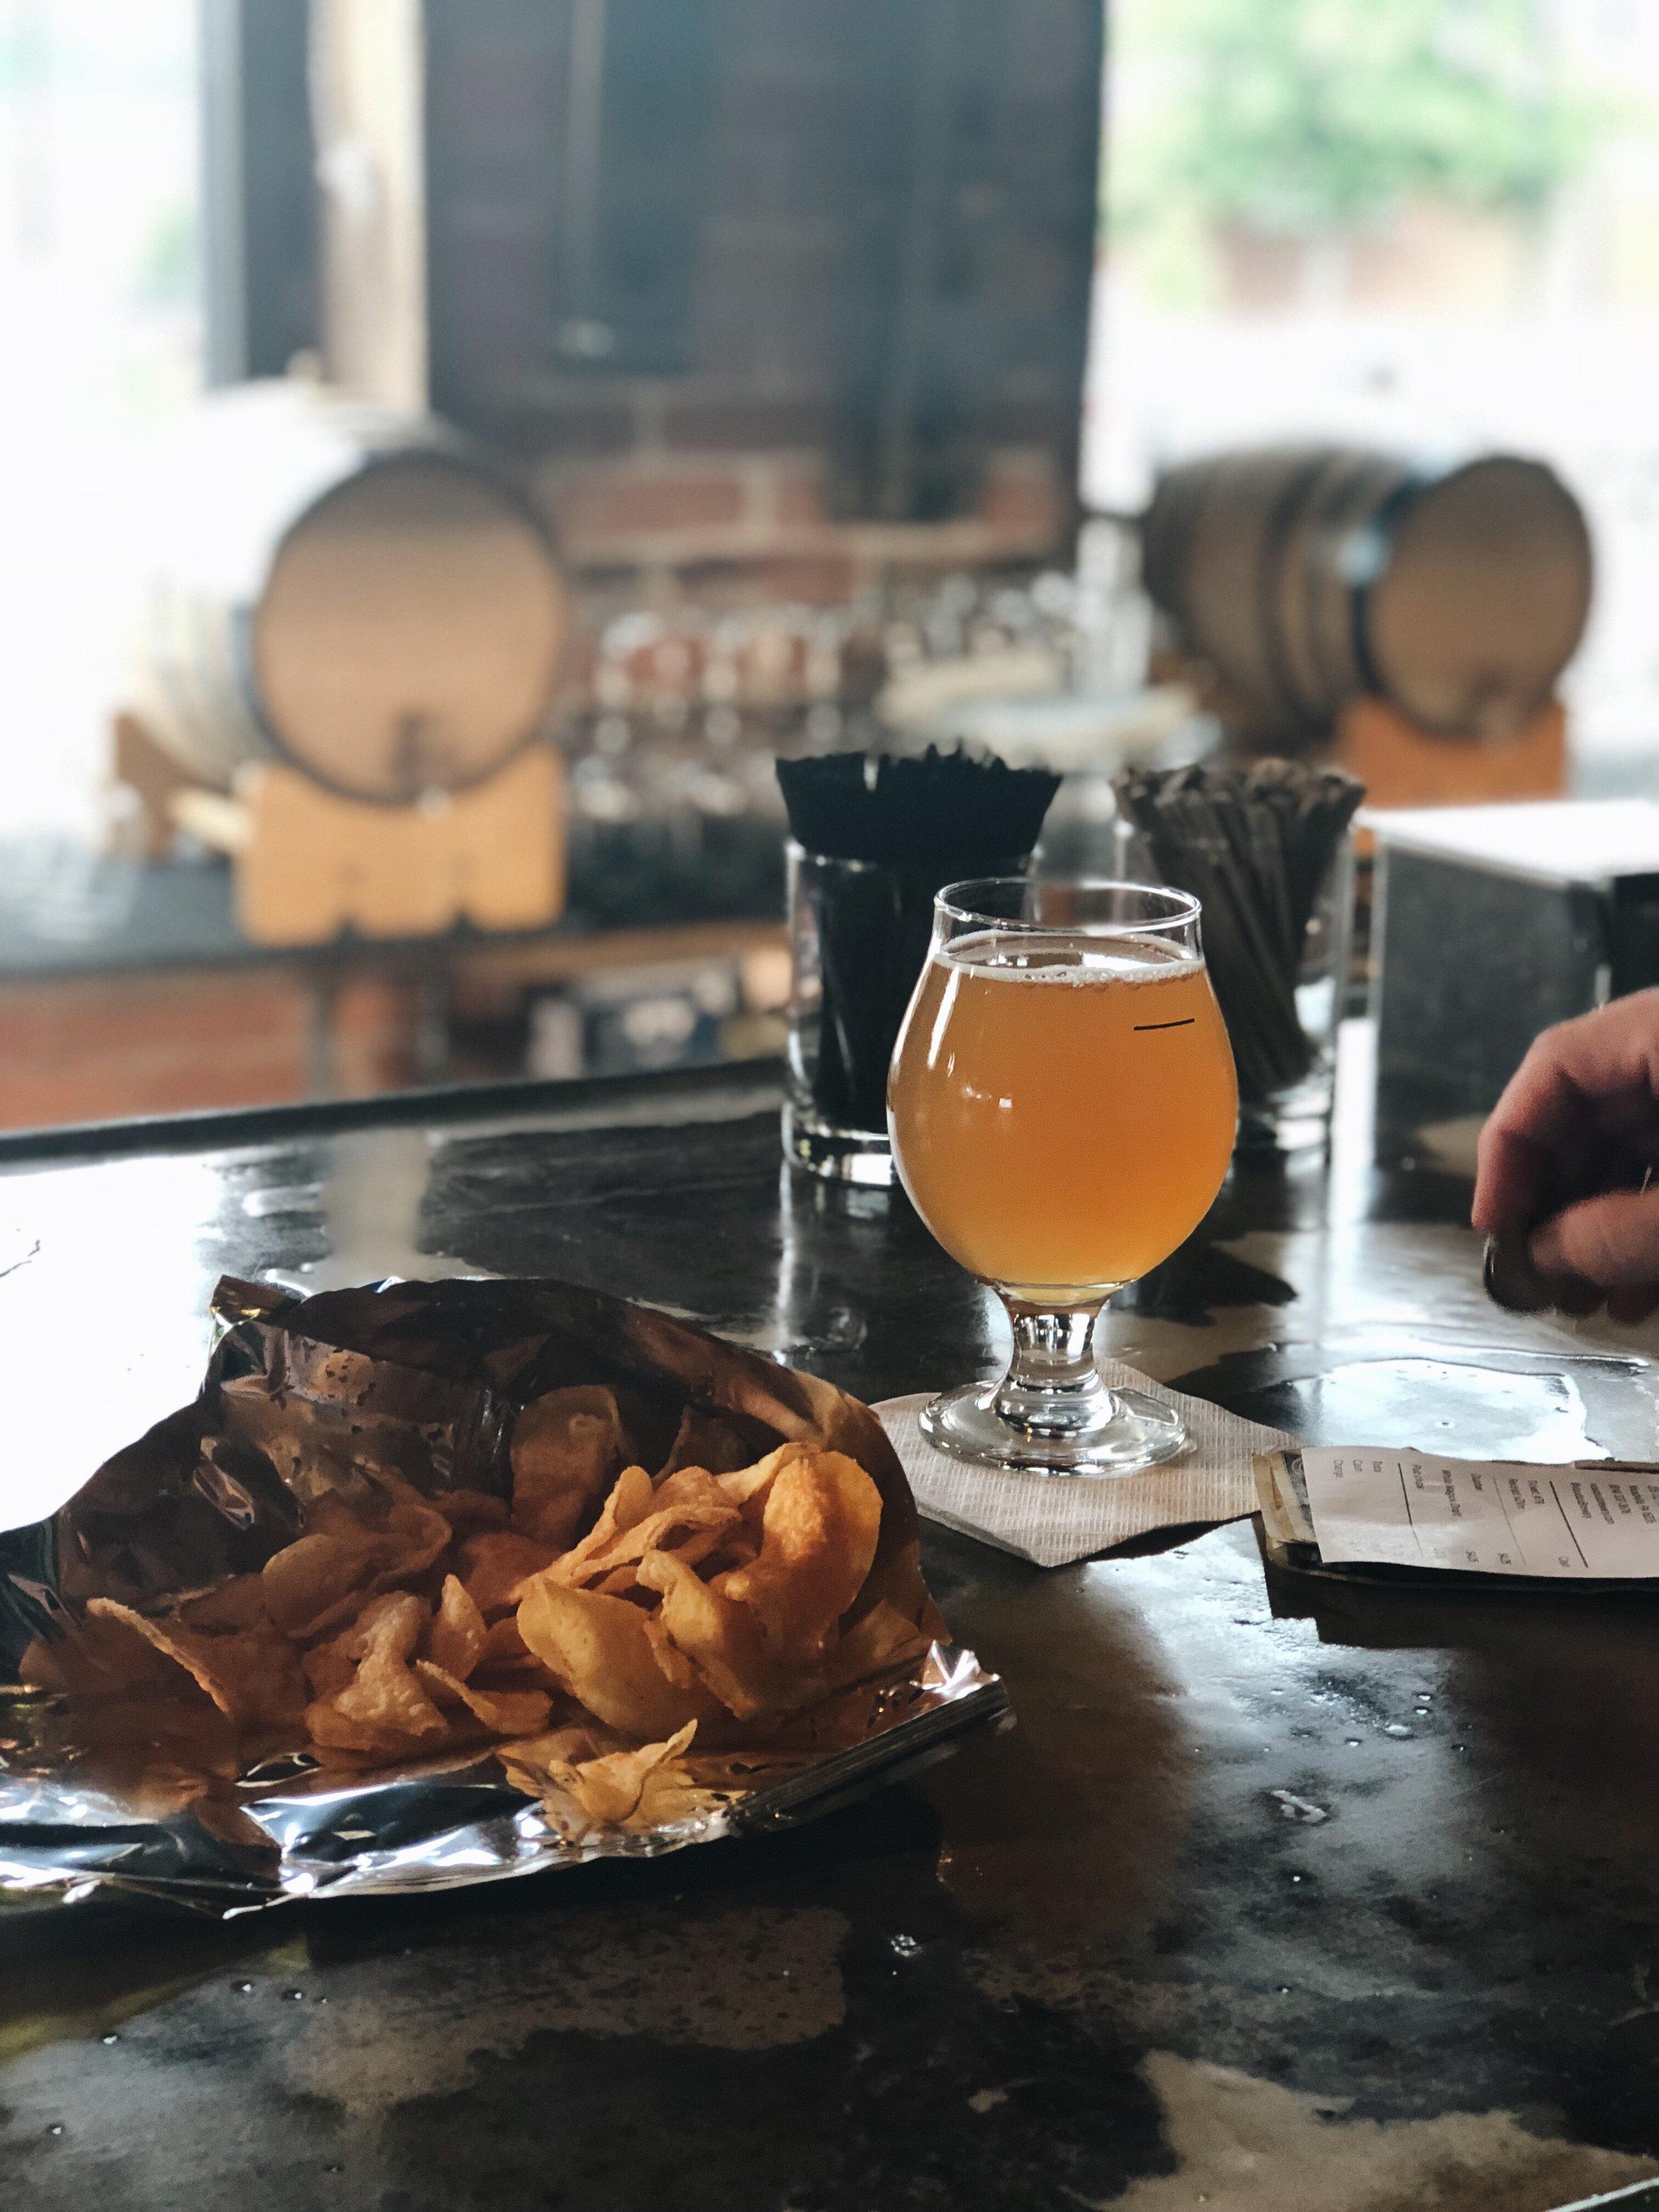 Voodoo-Brewery-Meadville-lovenothingmore-blogger3.JPG